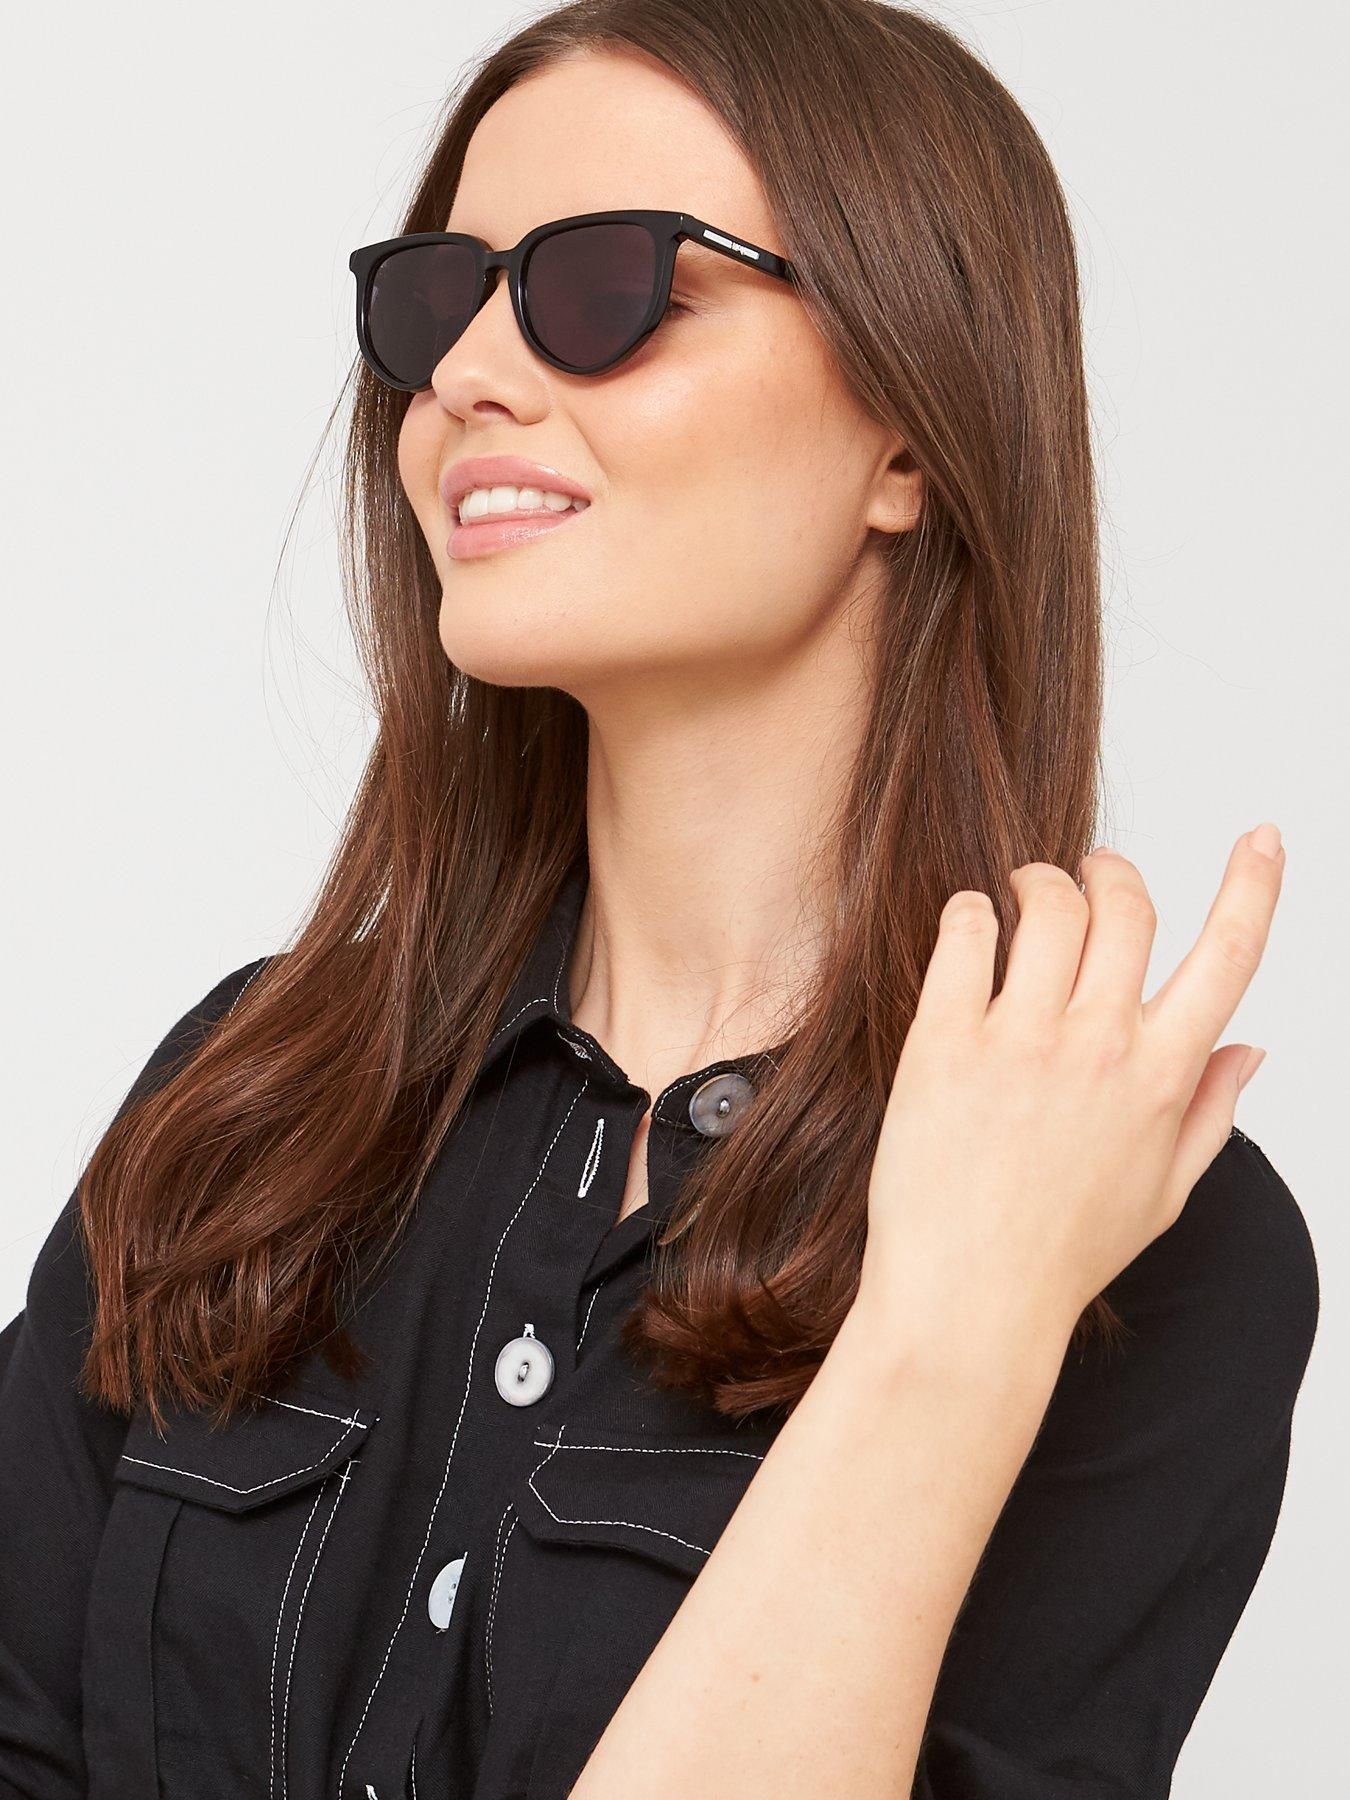 Mcq Alexander Mcqueen Round Sunglasses in Black